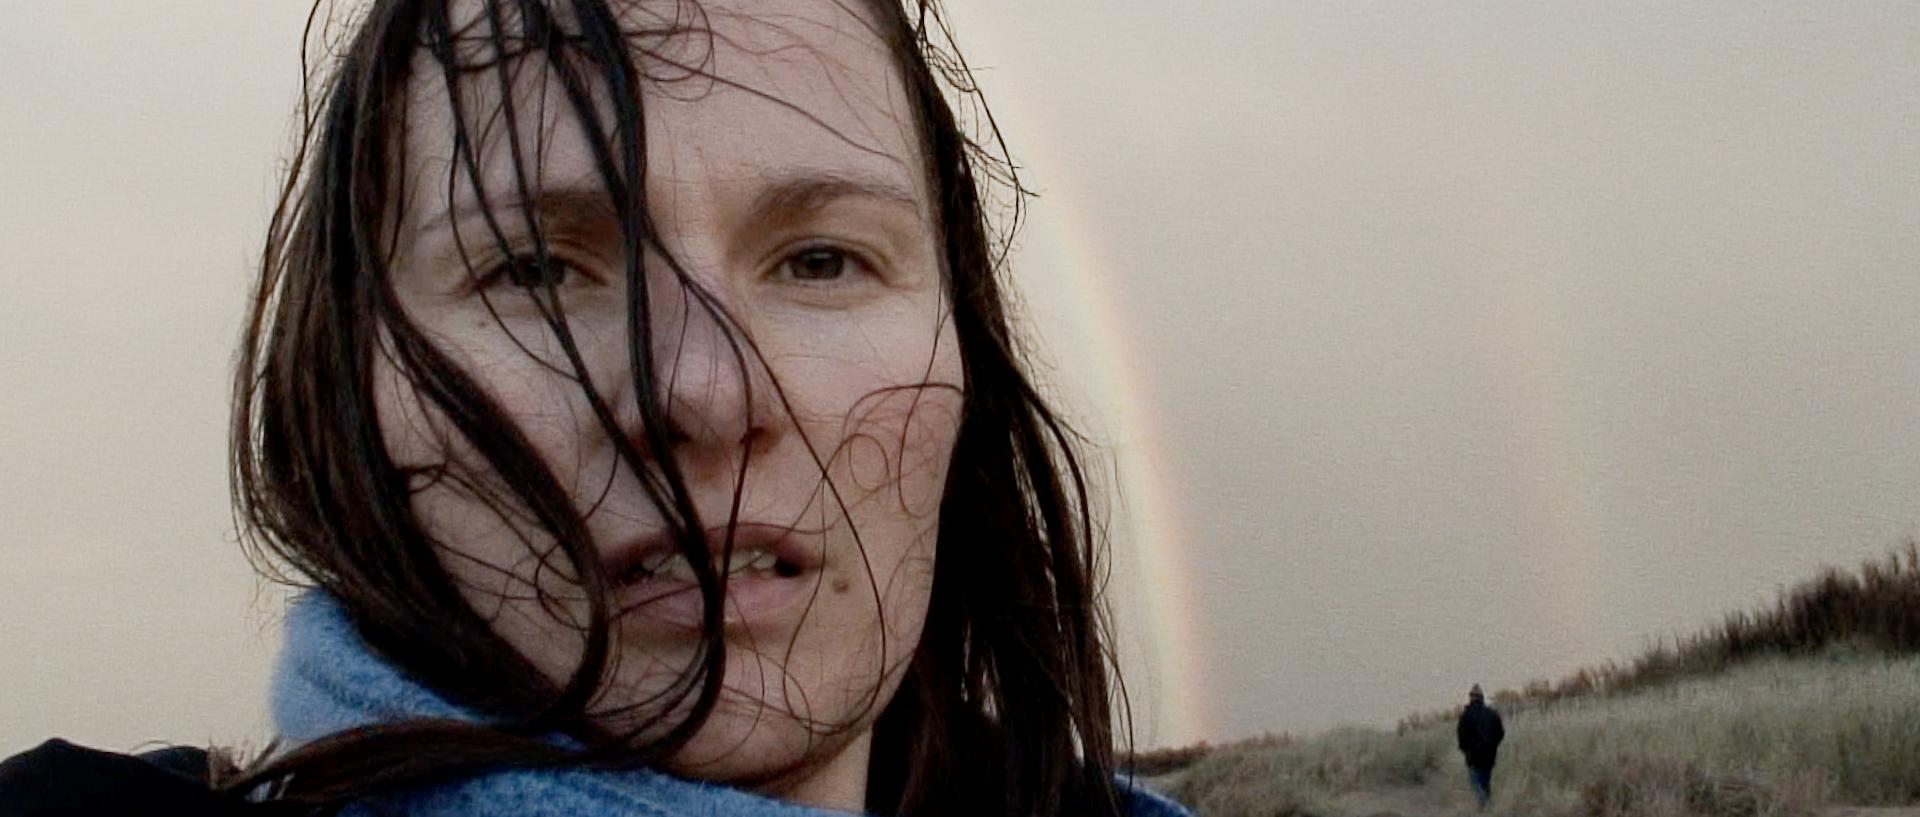 Timelife Stephanie Benamra film Hamid Benamra